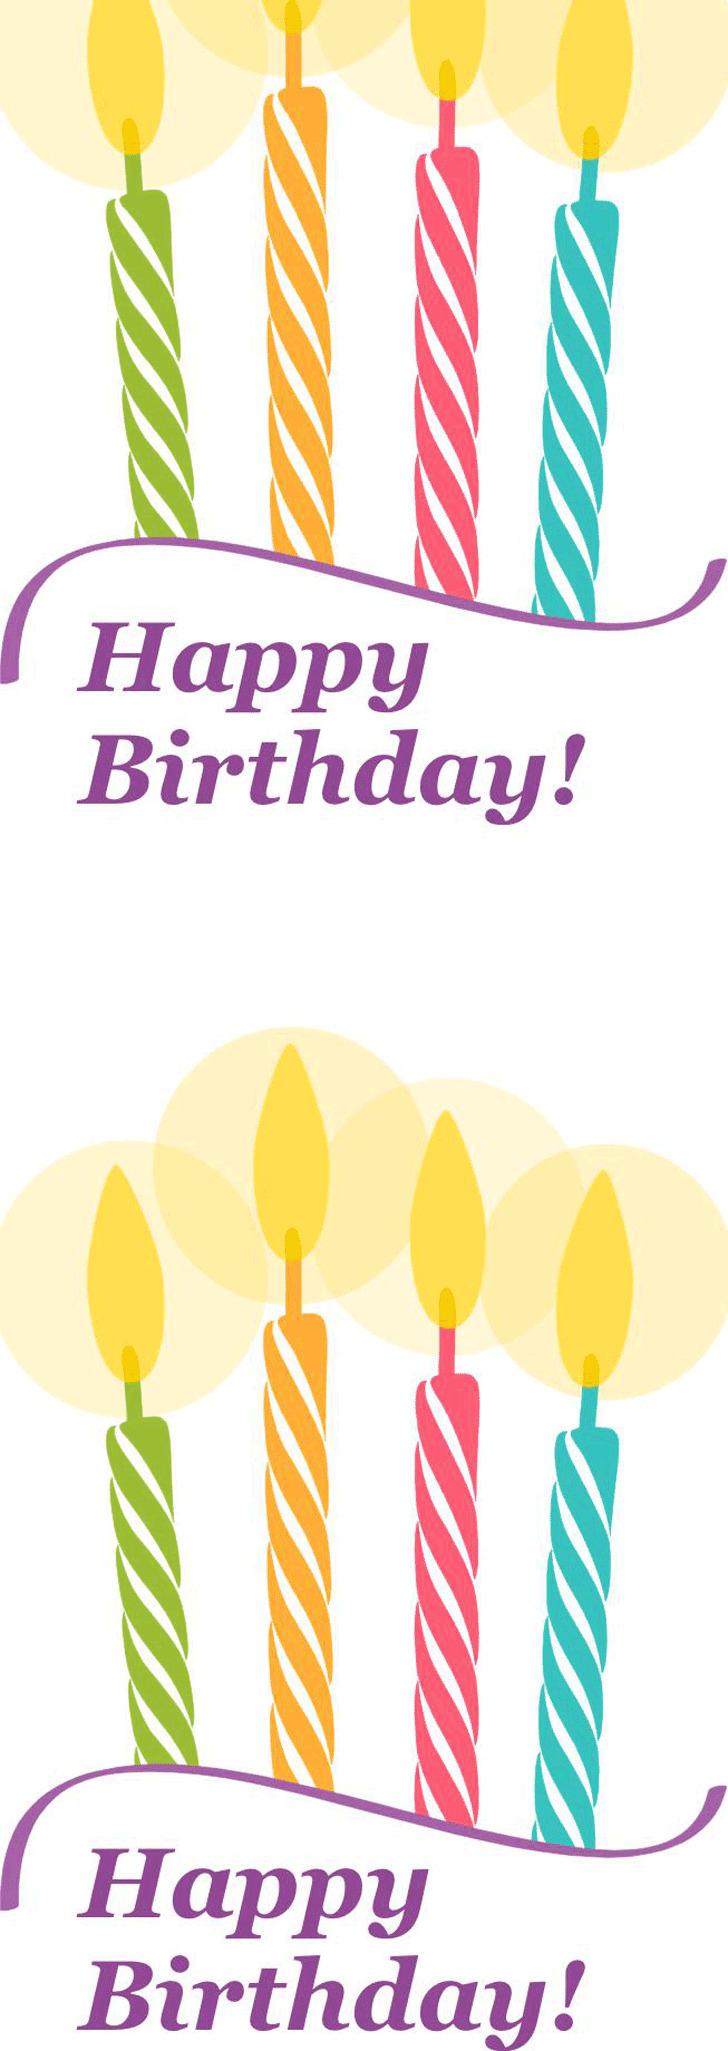 Birthday Card Template 3